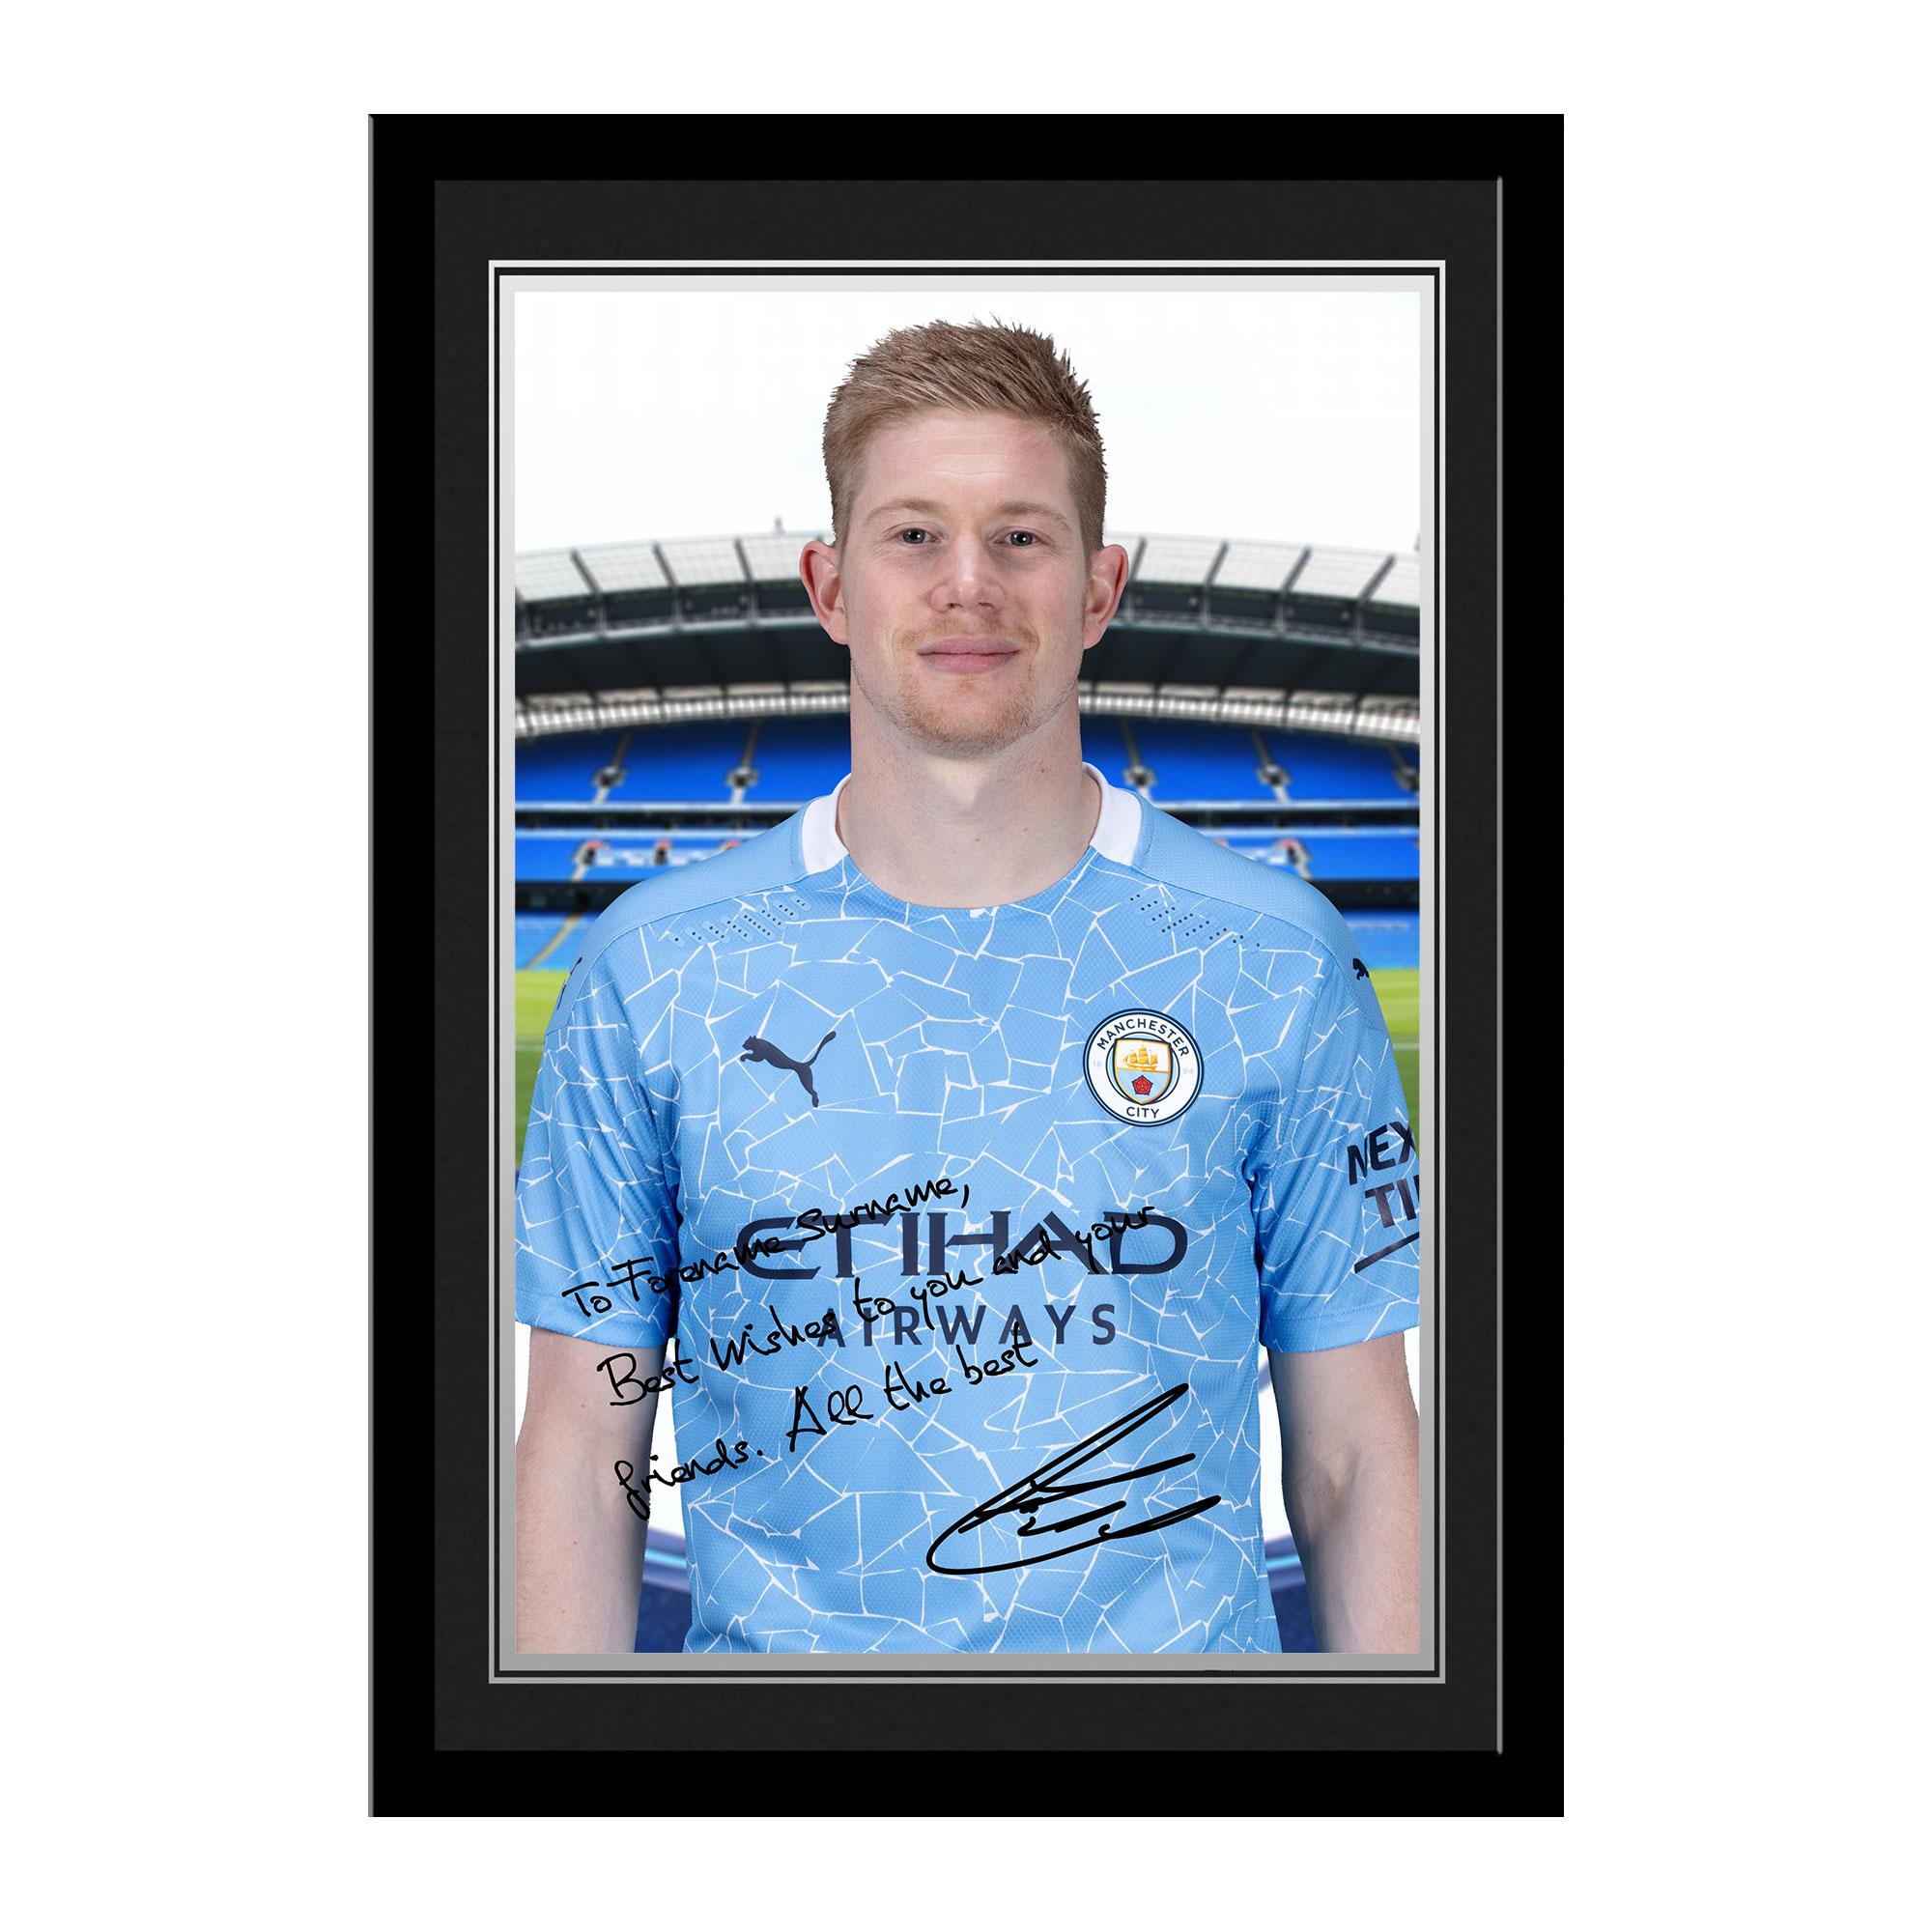 Manchester City FC De Bruyne Autograph Photo Framed